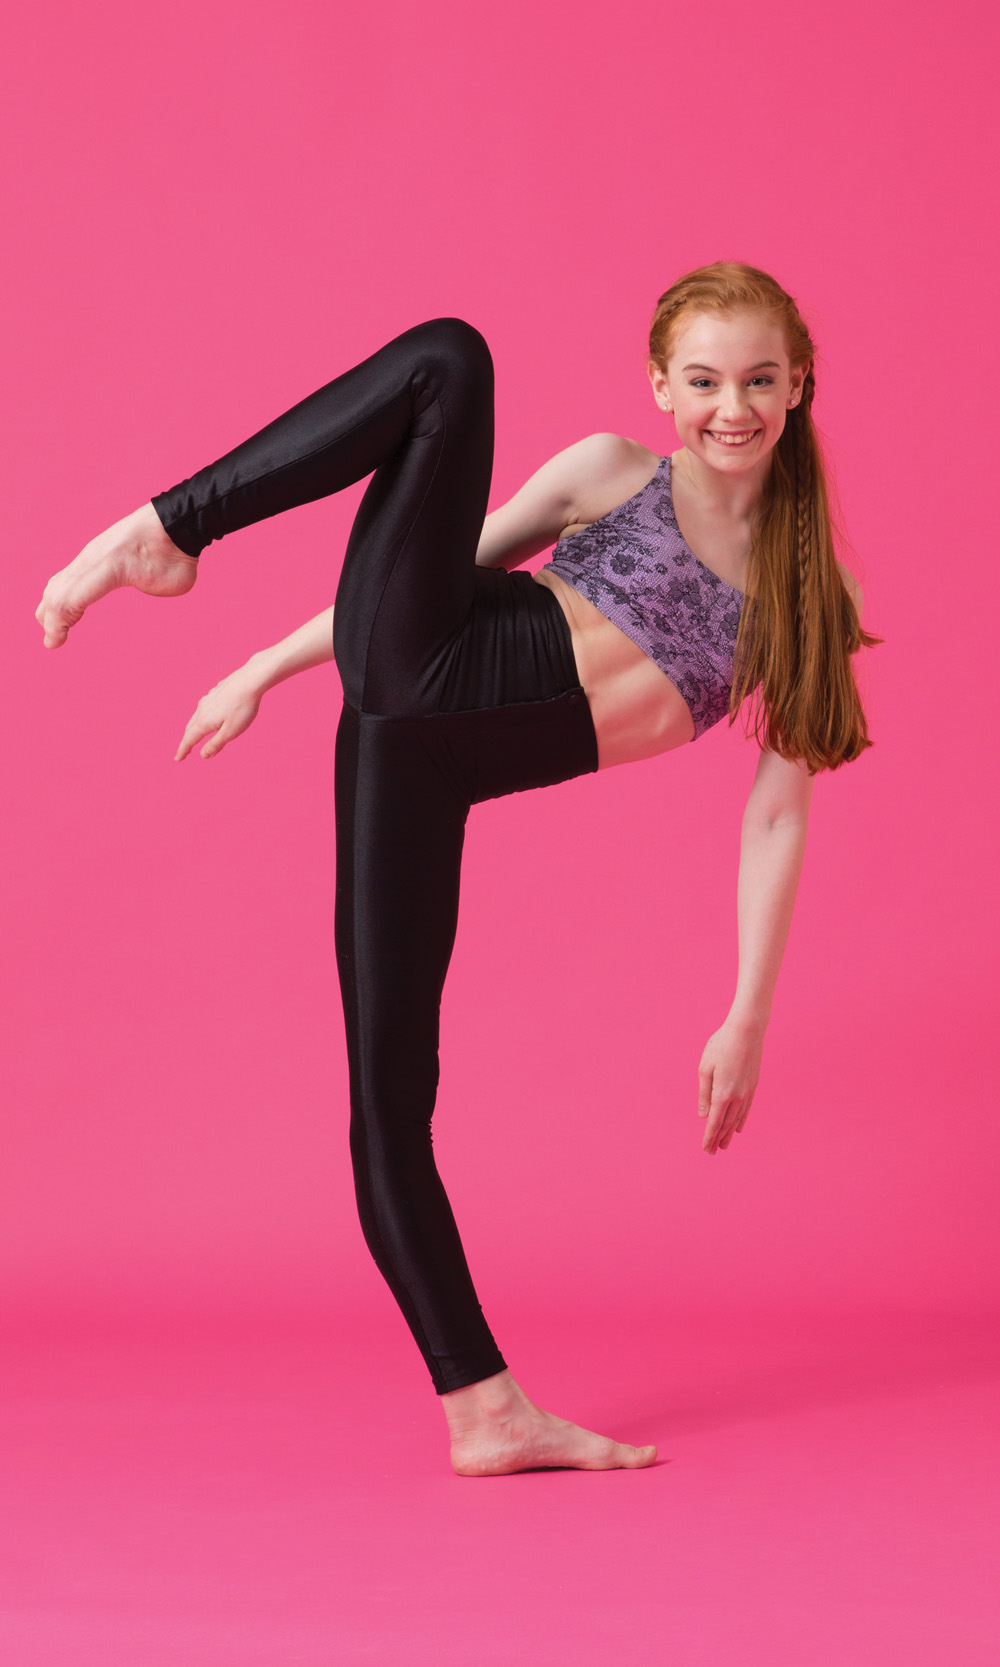 Leg Tilt Dance | www.pixshark.com - Images Galleries With ...